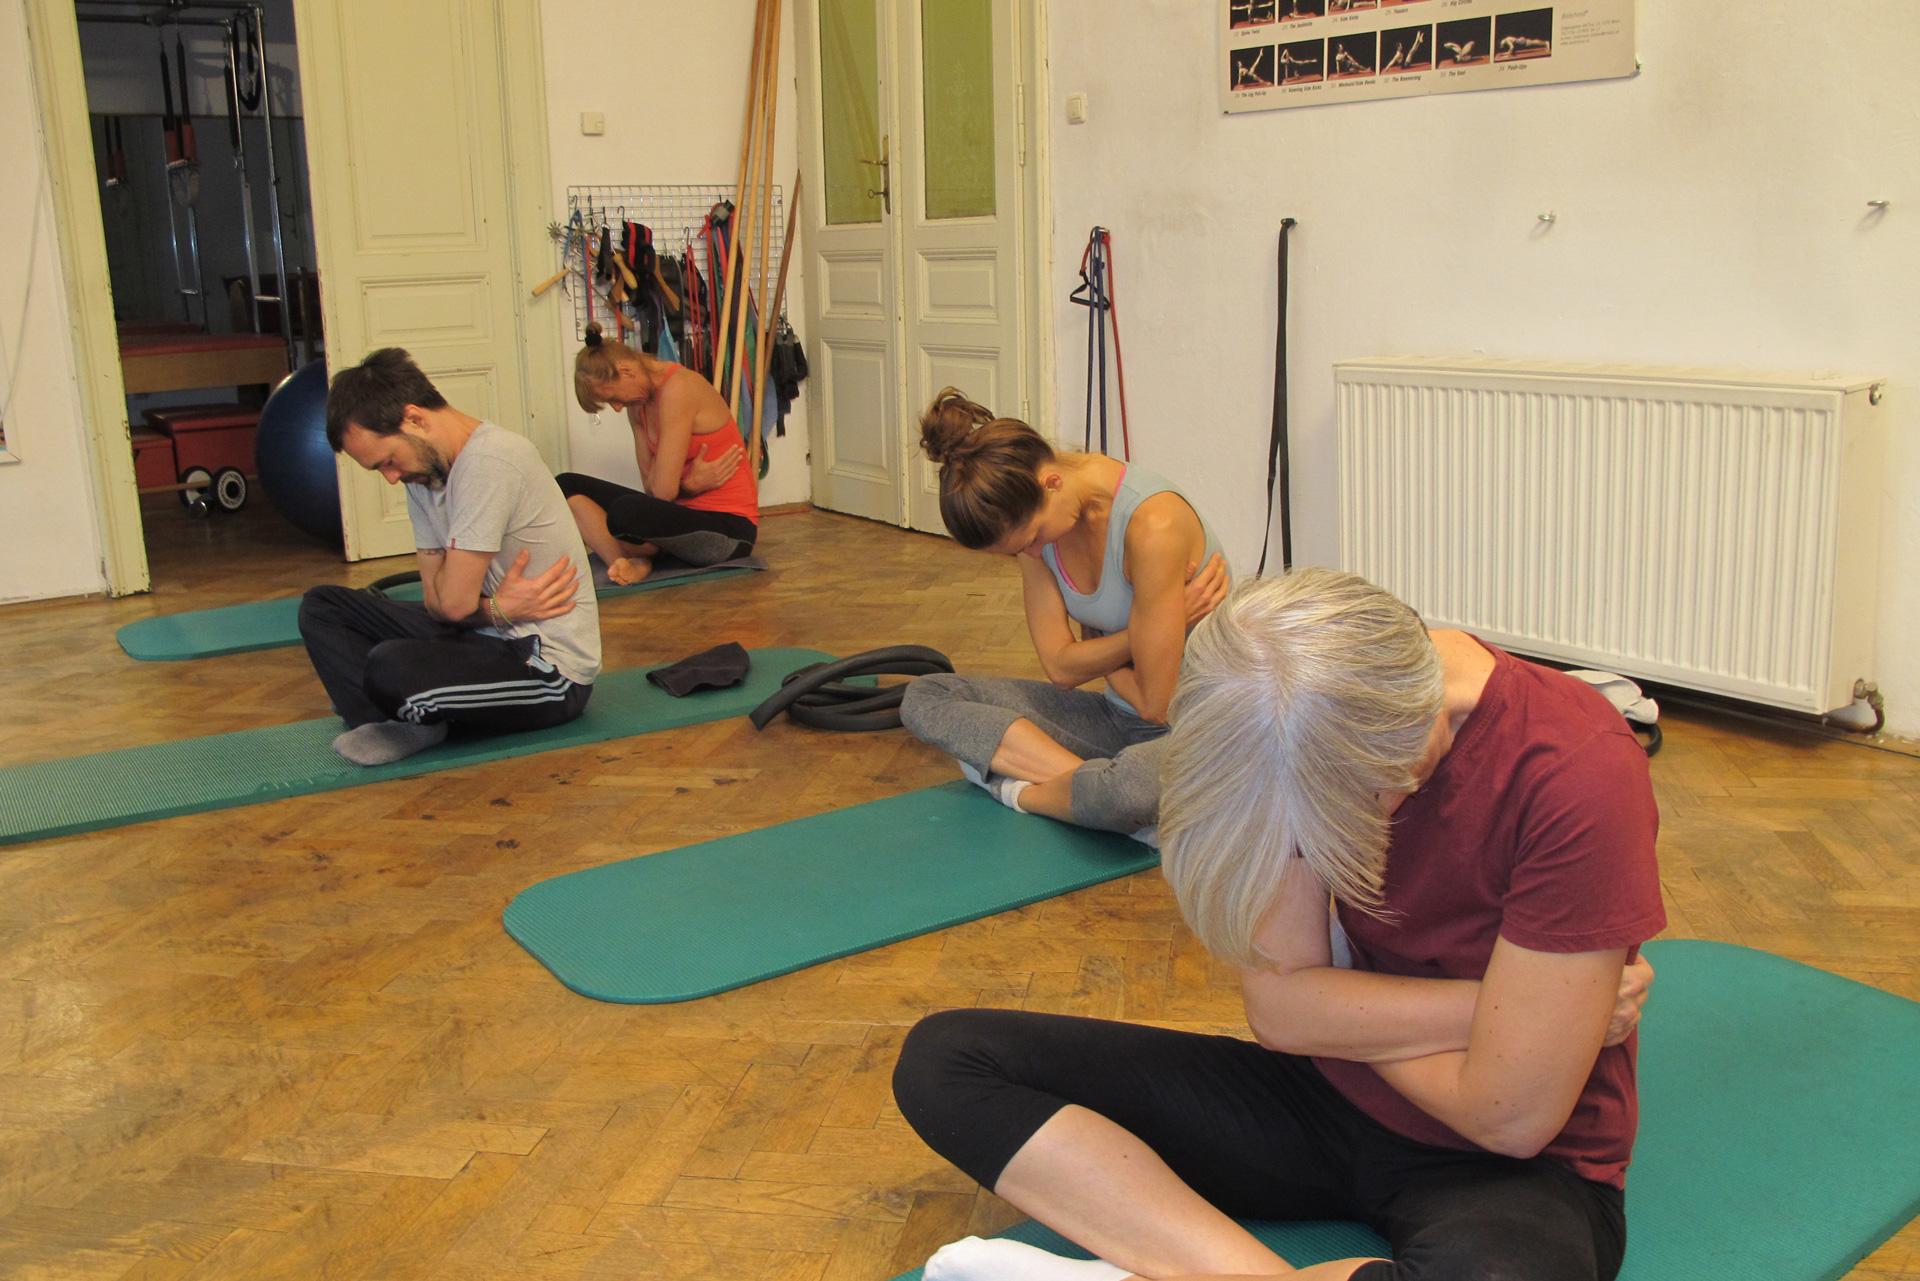 Pilates lateral posteriore Atmung Trainingsoptimierung Vorbereitung